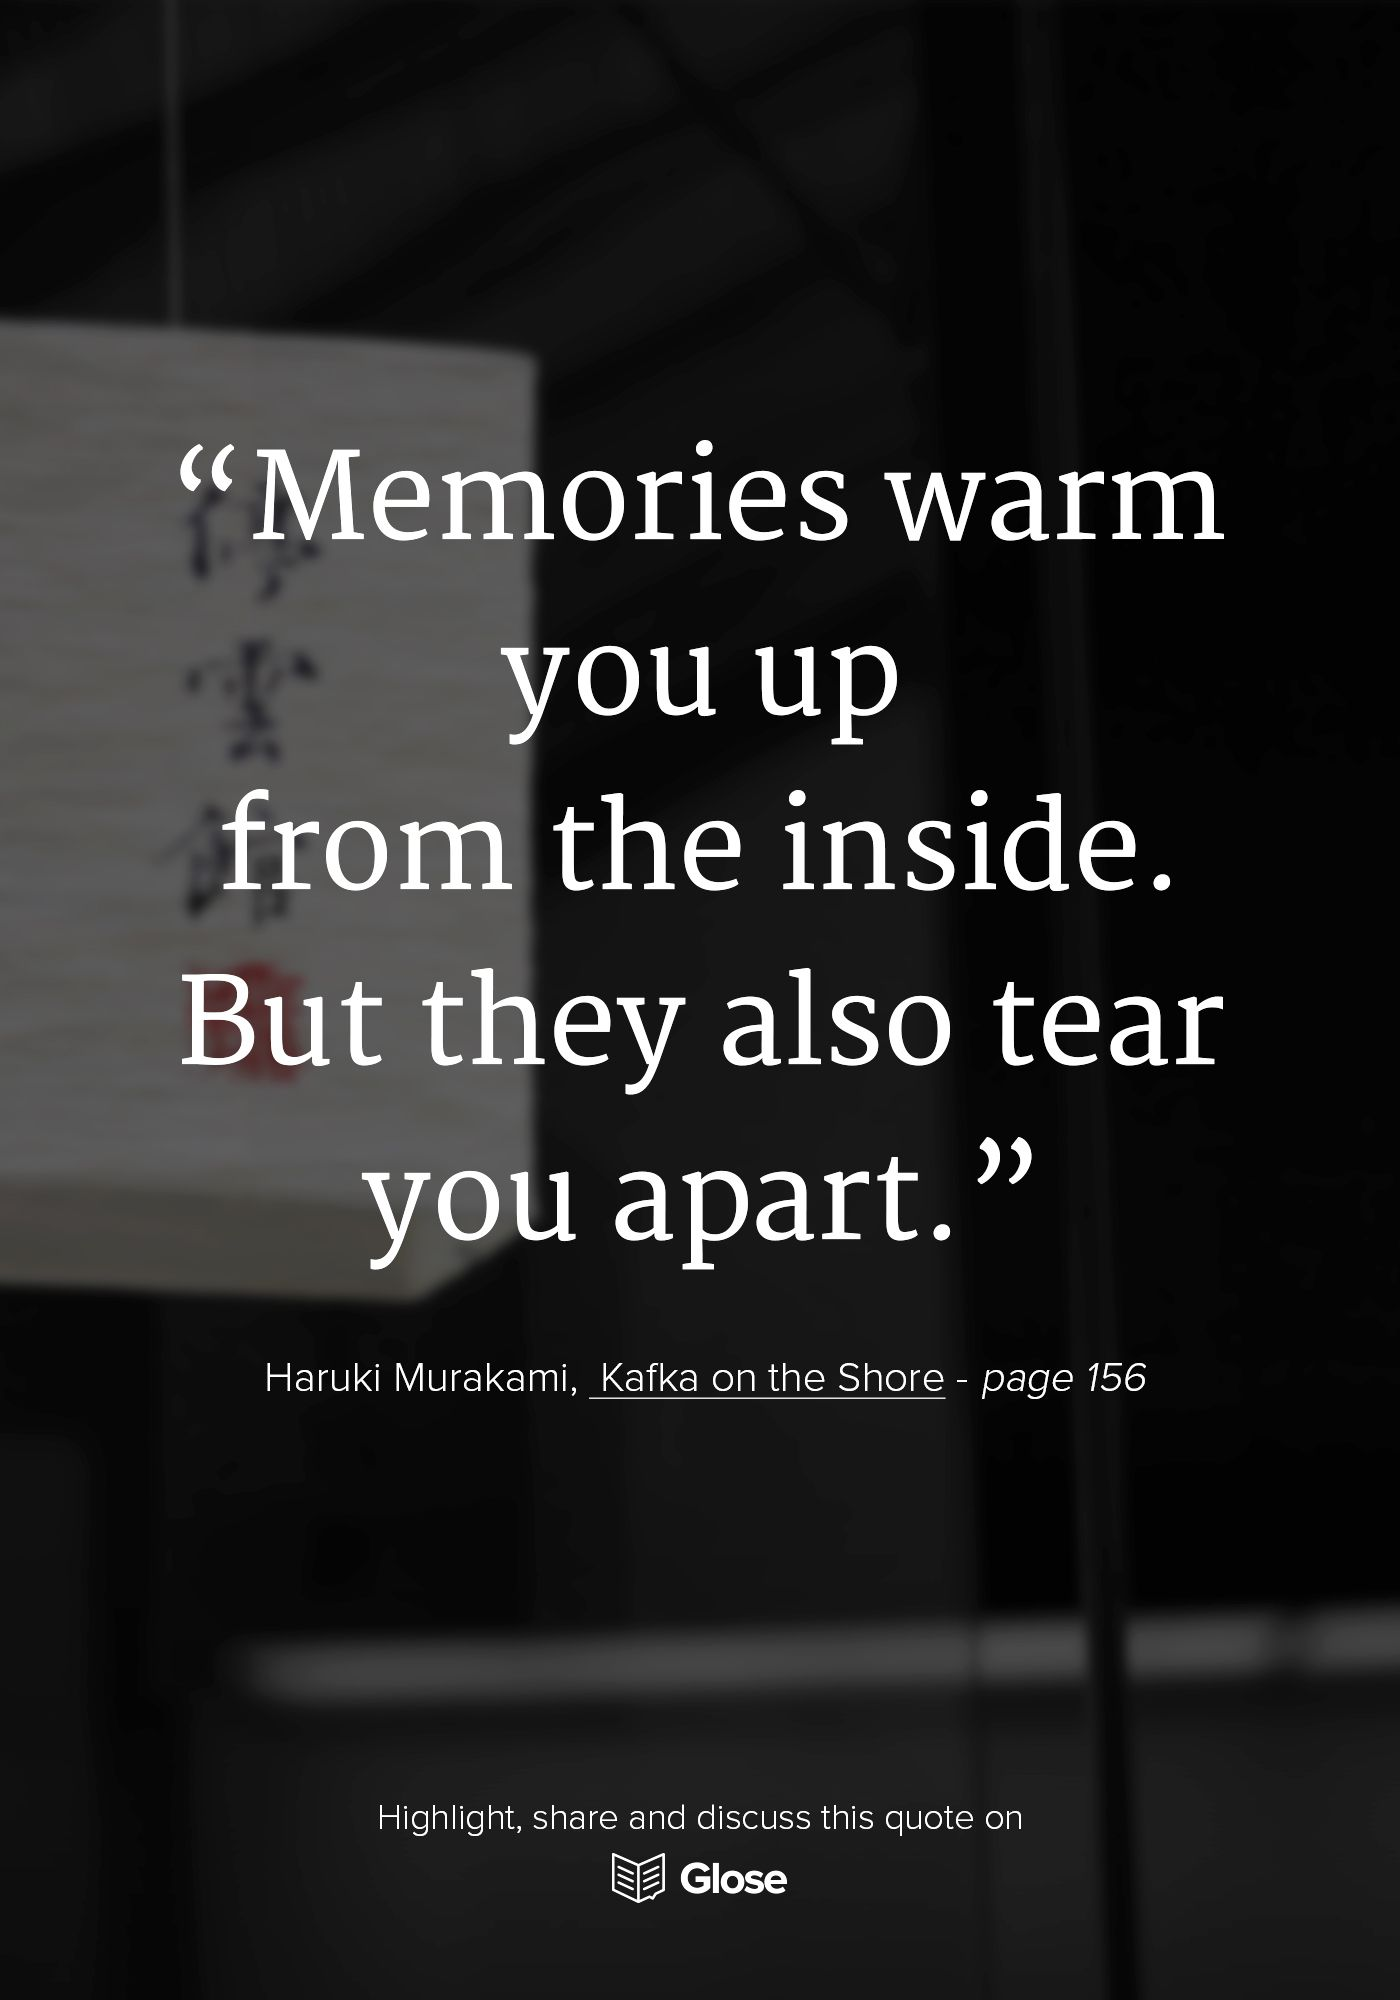 Haruki Murakami Kafka On The Shore Highlight Share And Discuss